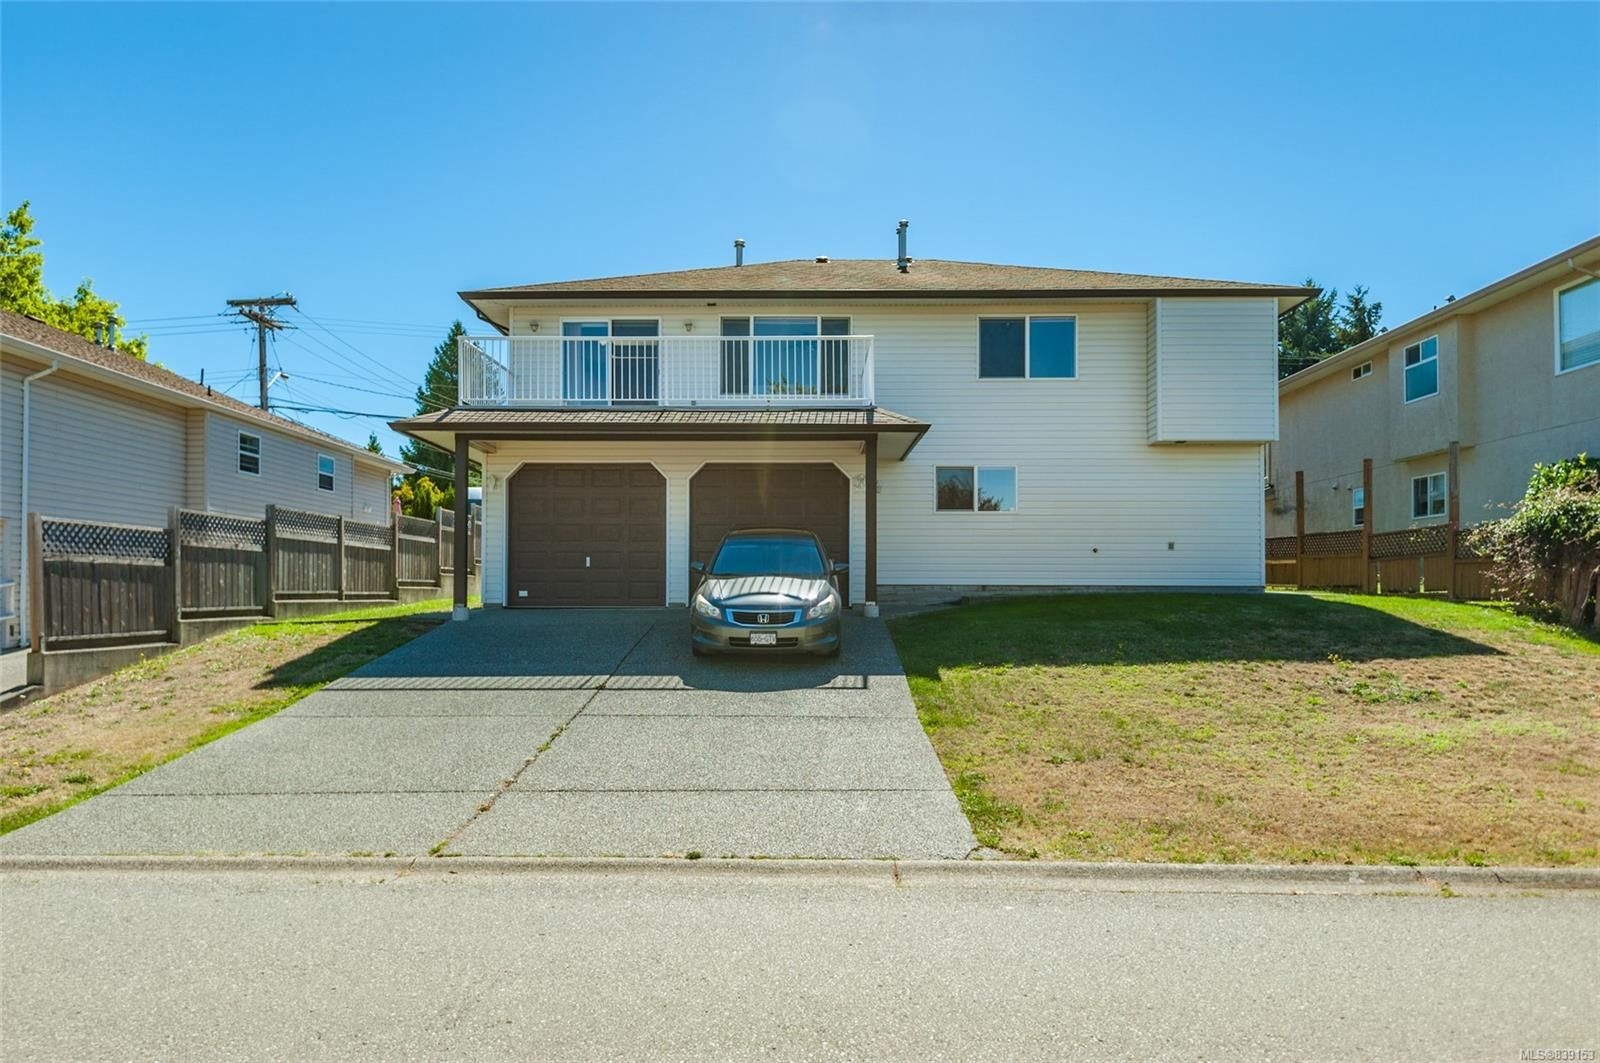 Photo 2: Photos: 6412 Dover Rd in NANAIMO: Na North Nanaimo House for sale (Nanaimo)  : MLS®# 839153